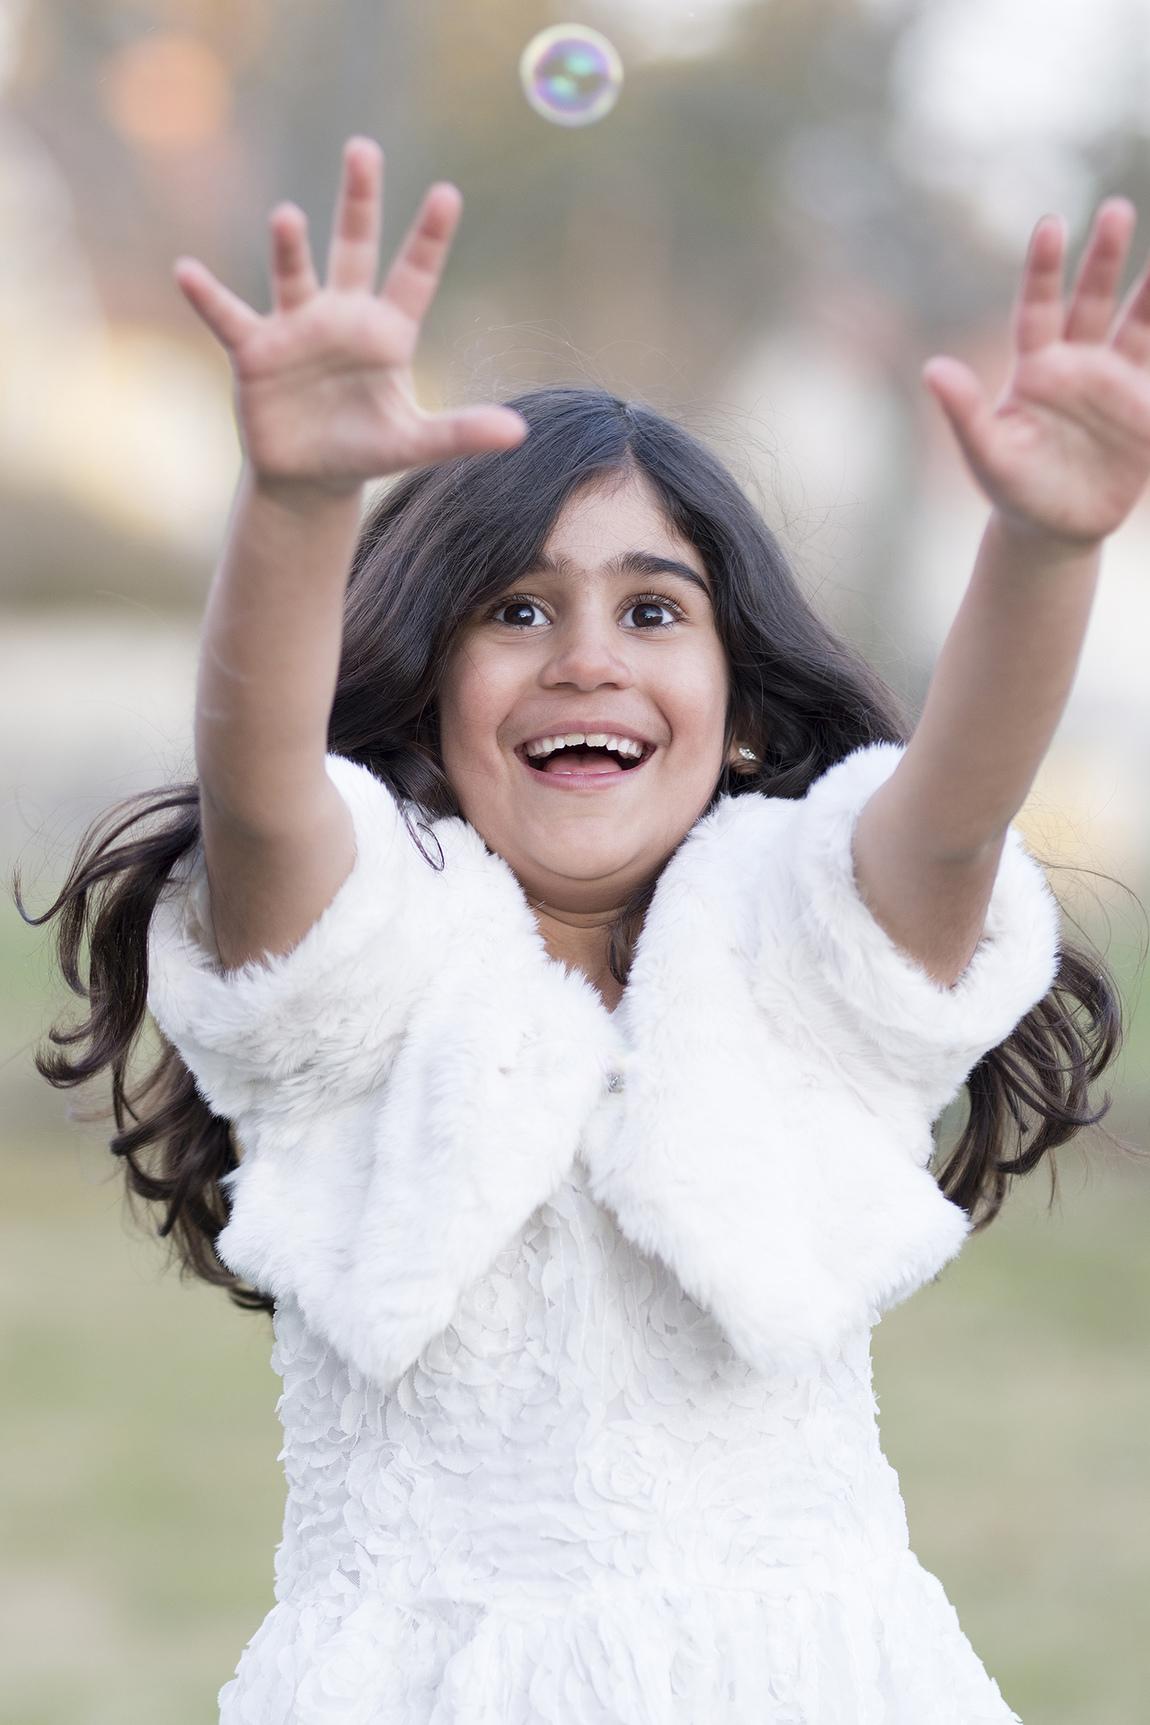 Photo By Hamed - Children